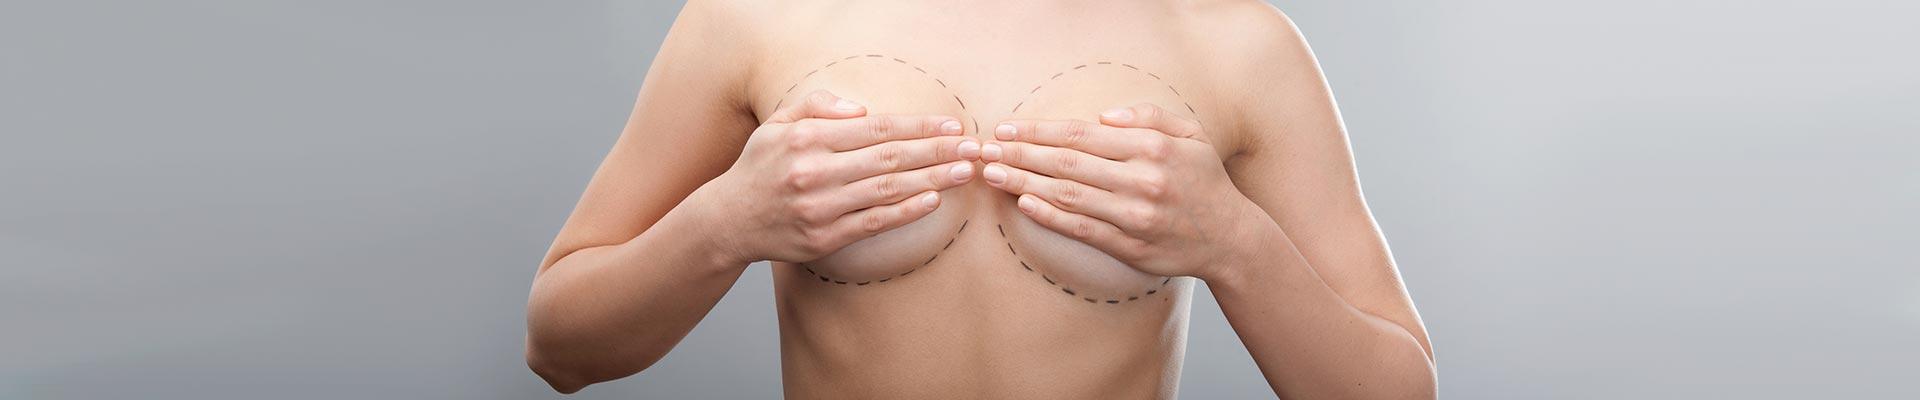 Mamoplastia de aumento – Prótese de Mama